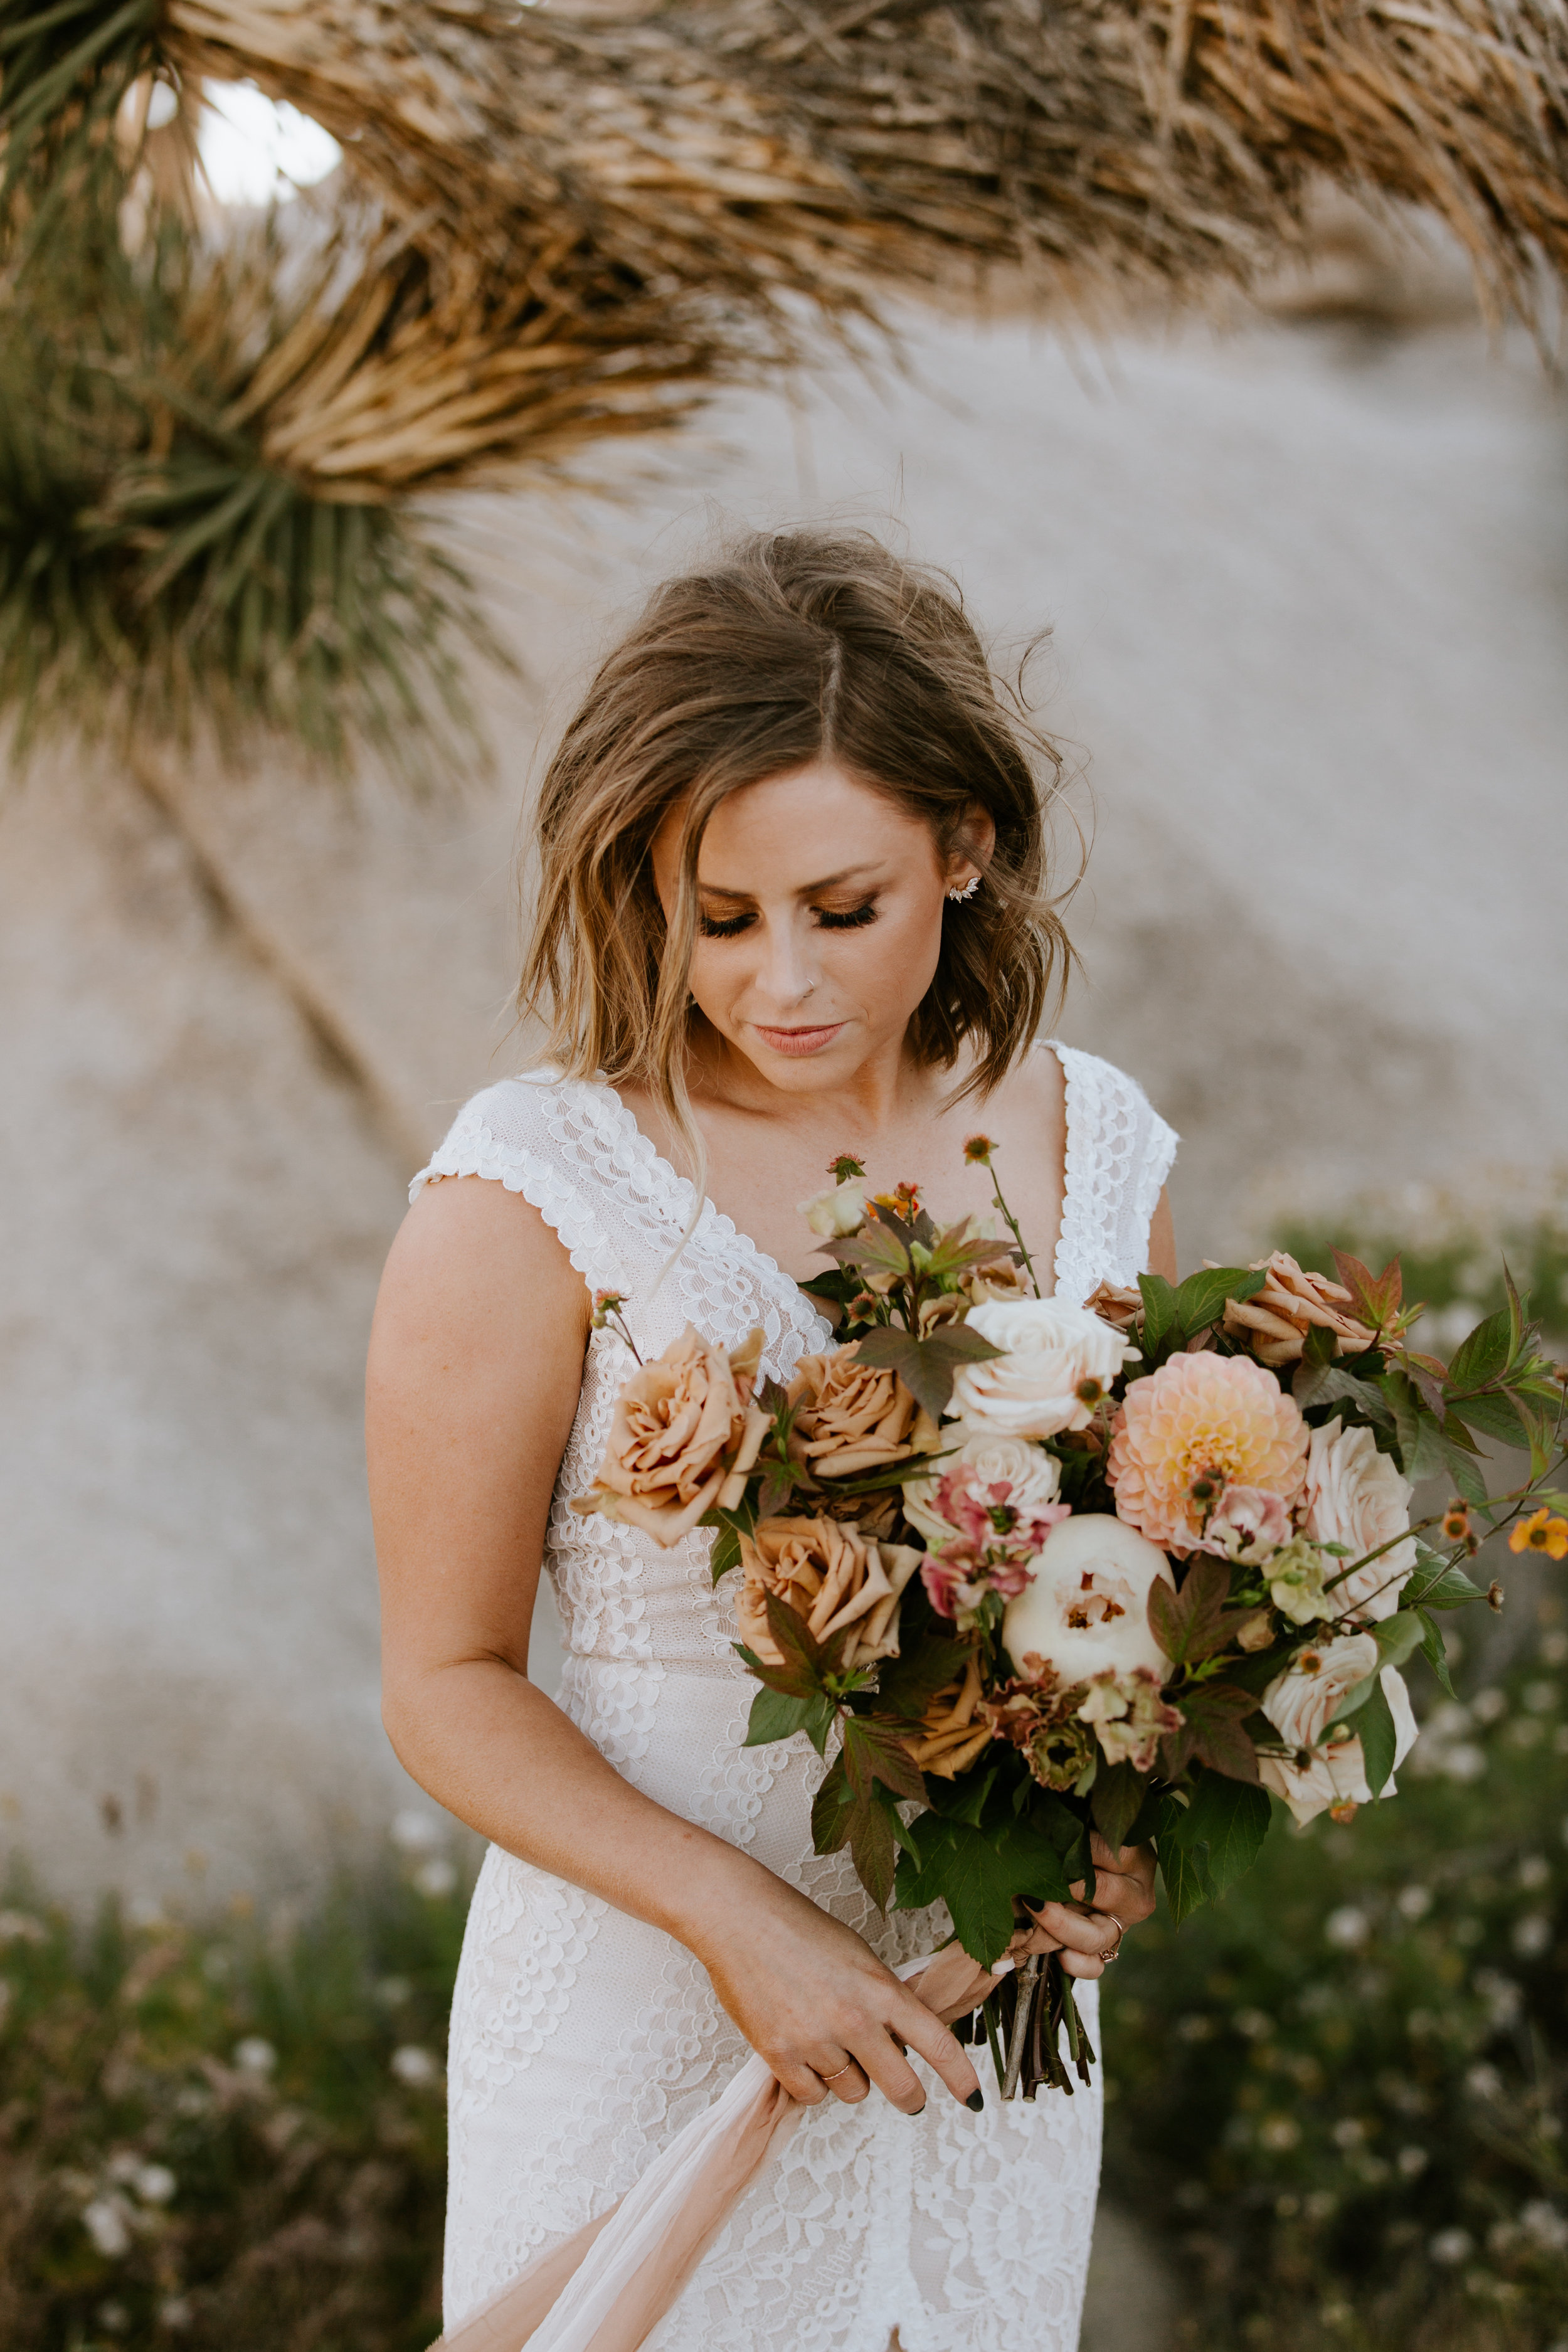 2019-05-26_Callie-Evan_Wedding_Joshua Tree_Paige Nelson_PREVIEWS HR-37.jpg